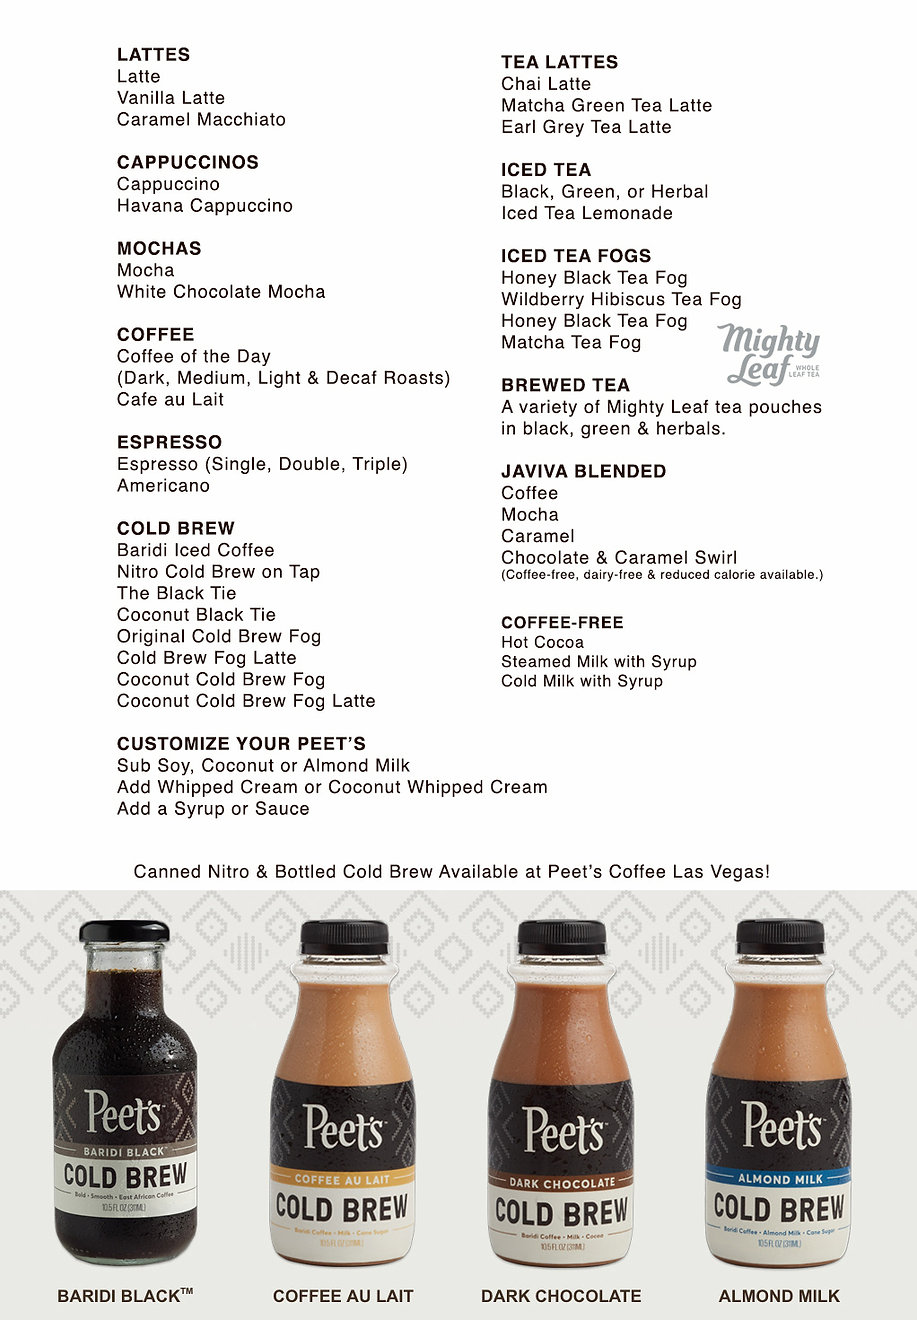 new-peets-menu.jpg